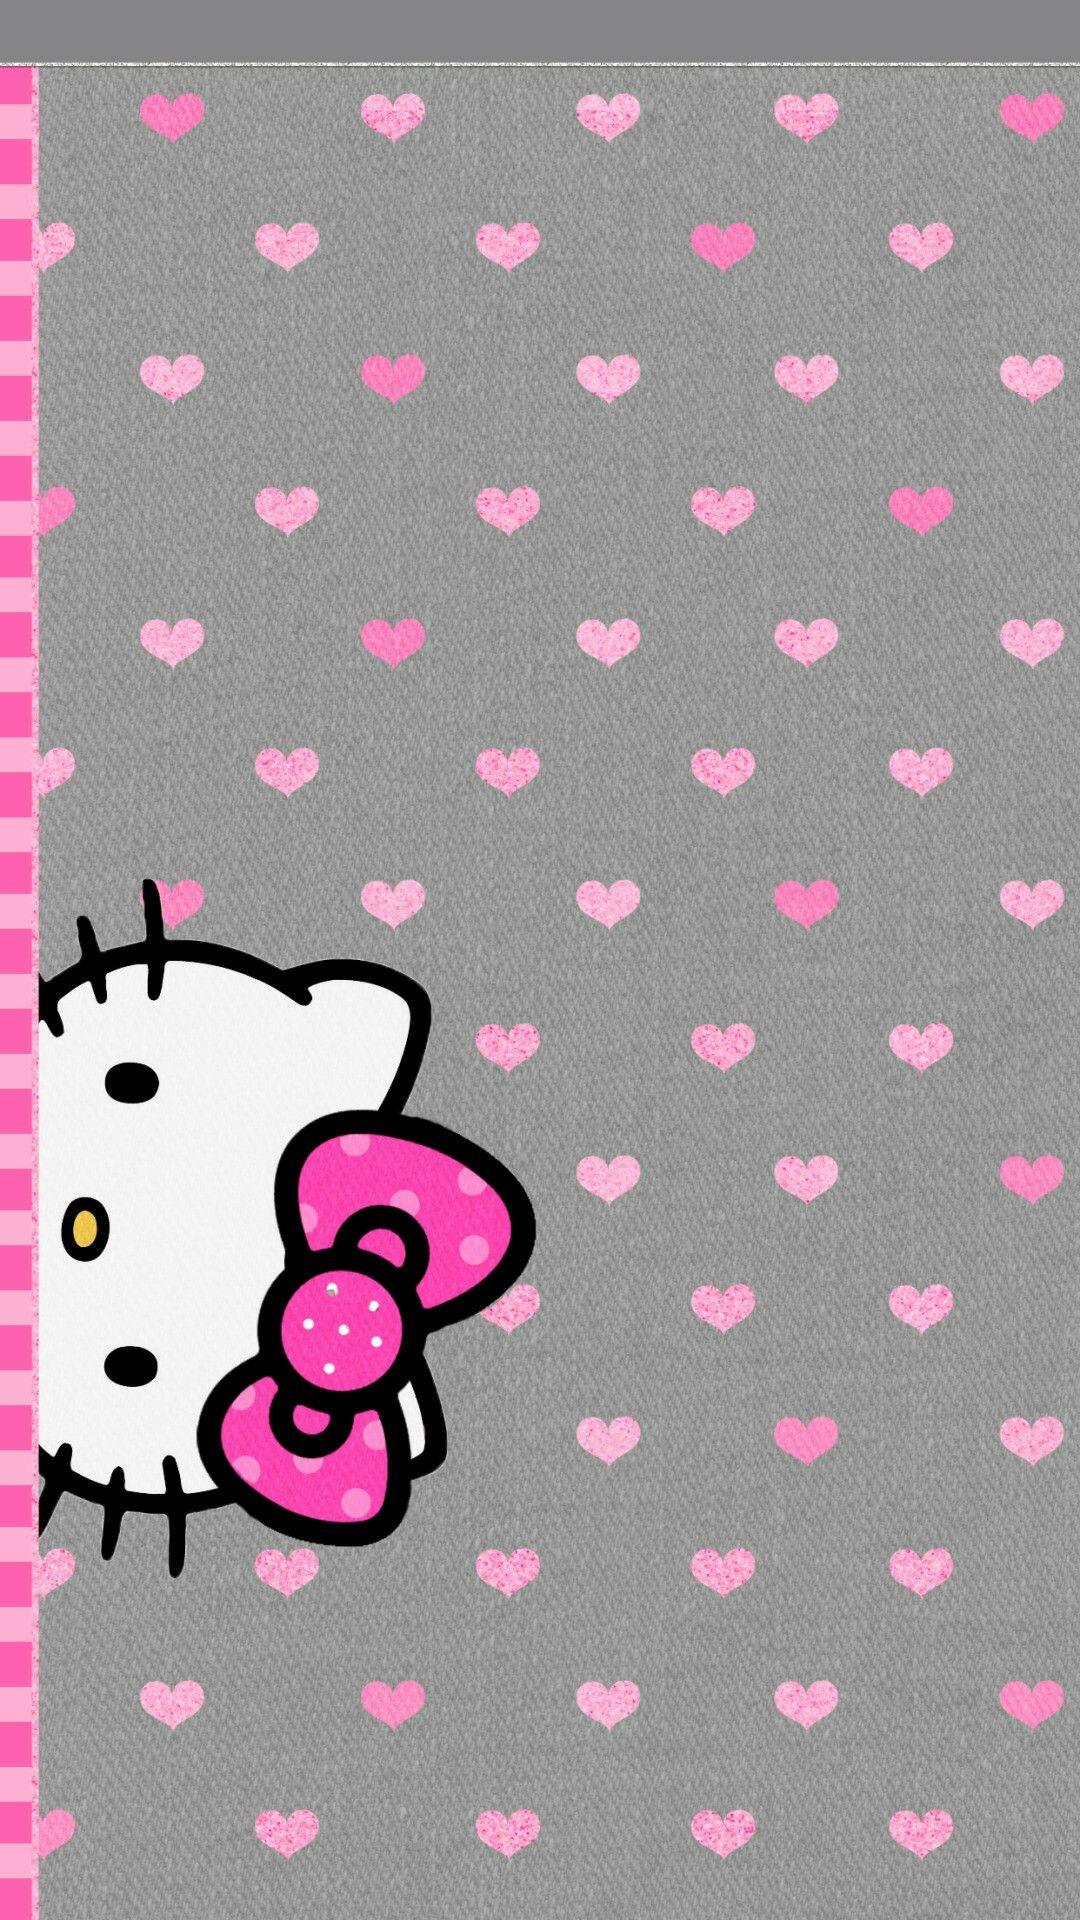 Amazing Wallpaper Hello Kitty Cell Phone - 5422b8112a6cd360da607d33bb25b53b  Photograph_706185.jpg